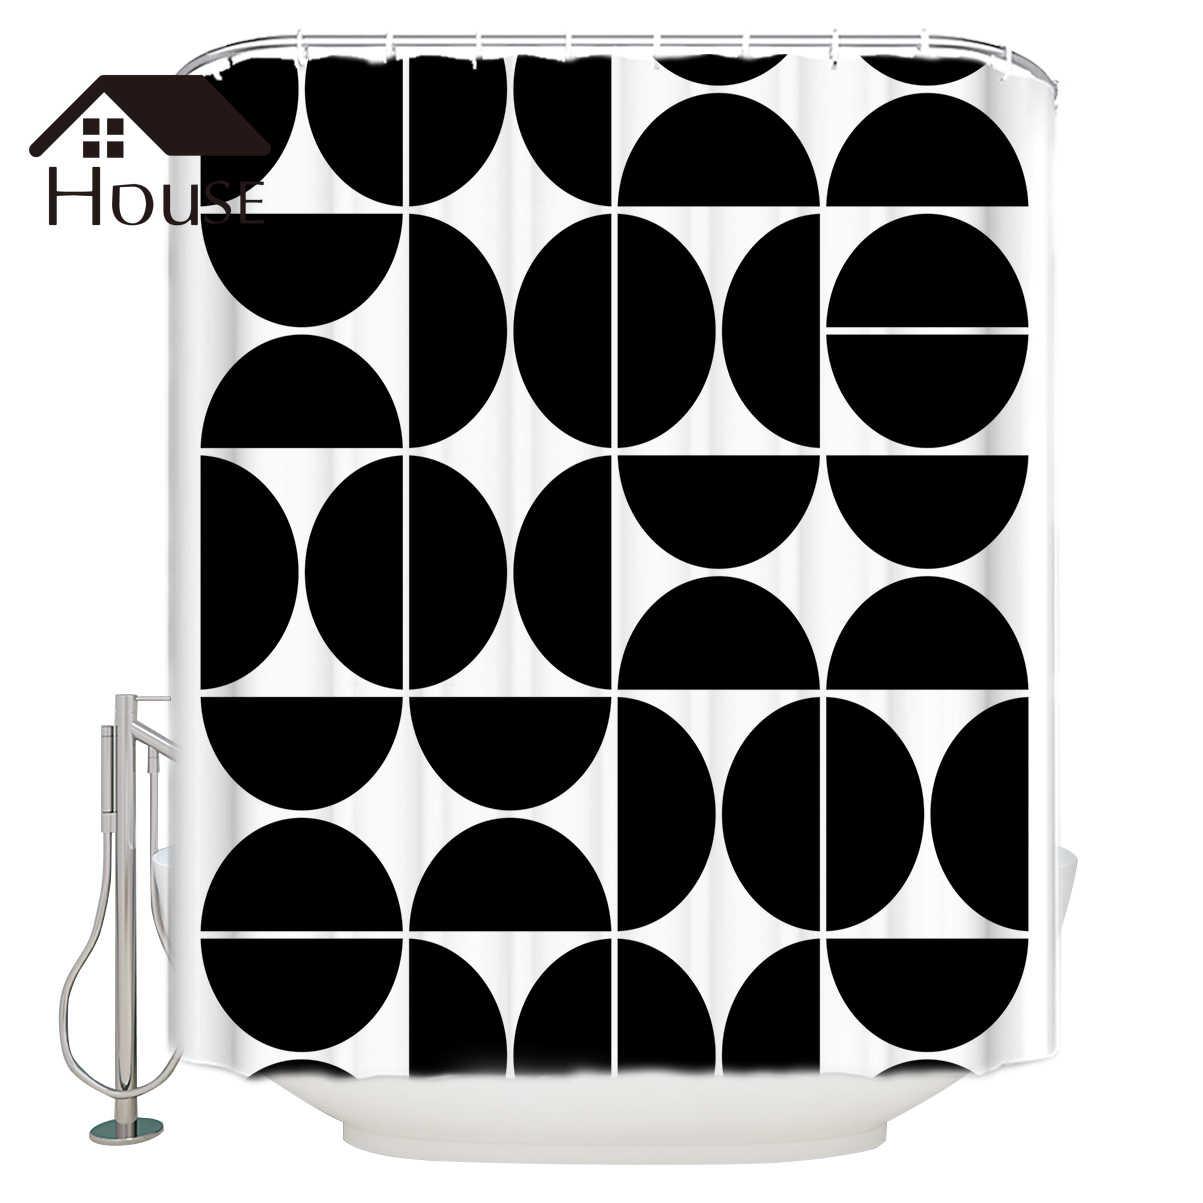 Image of: Bighouses Shower Curtain Mid Century Modern Geometric 04 Black Fabric Shower Curtain Hooks Shower Curtains Aliexpress